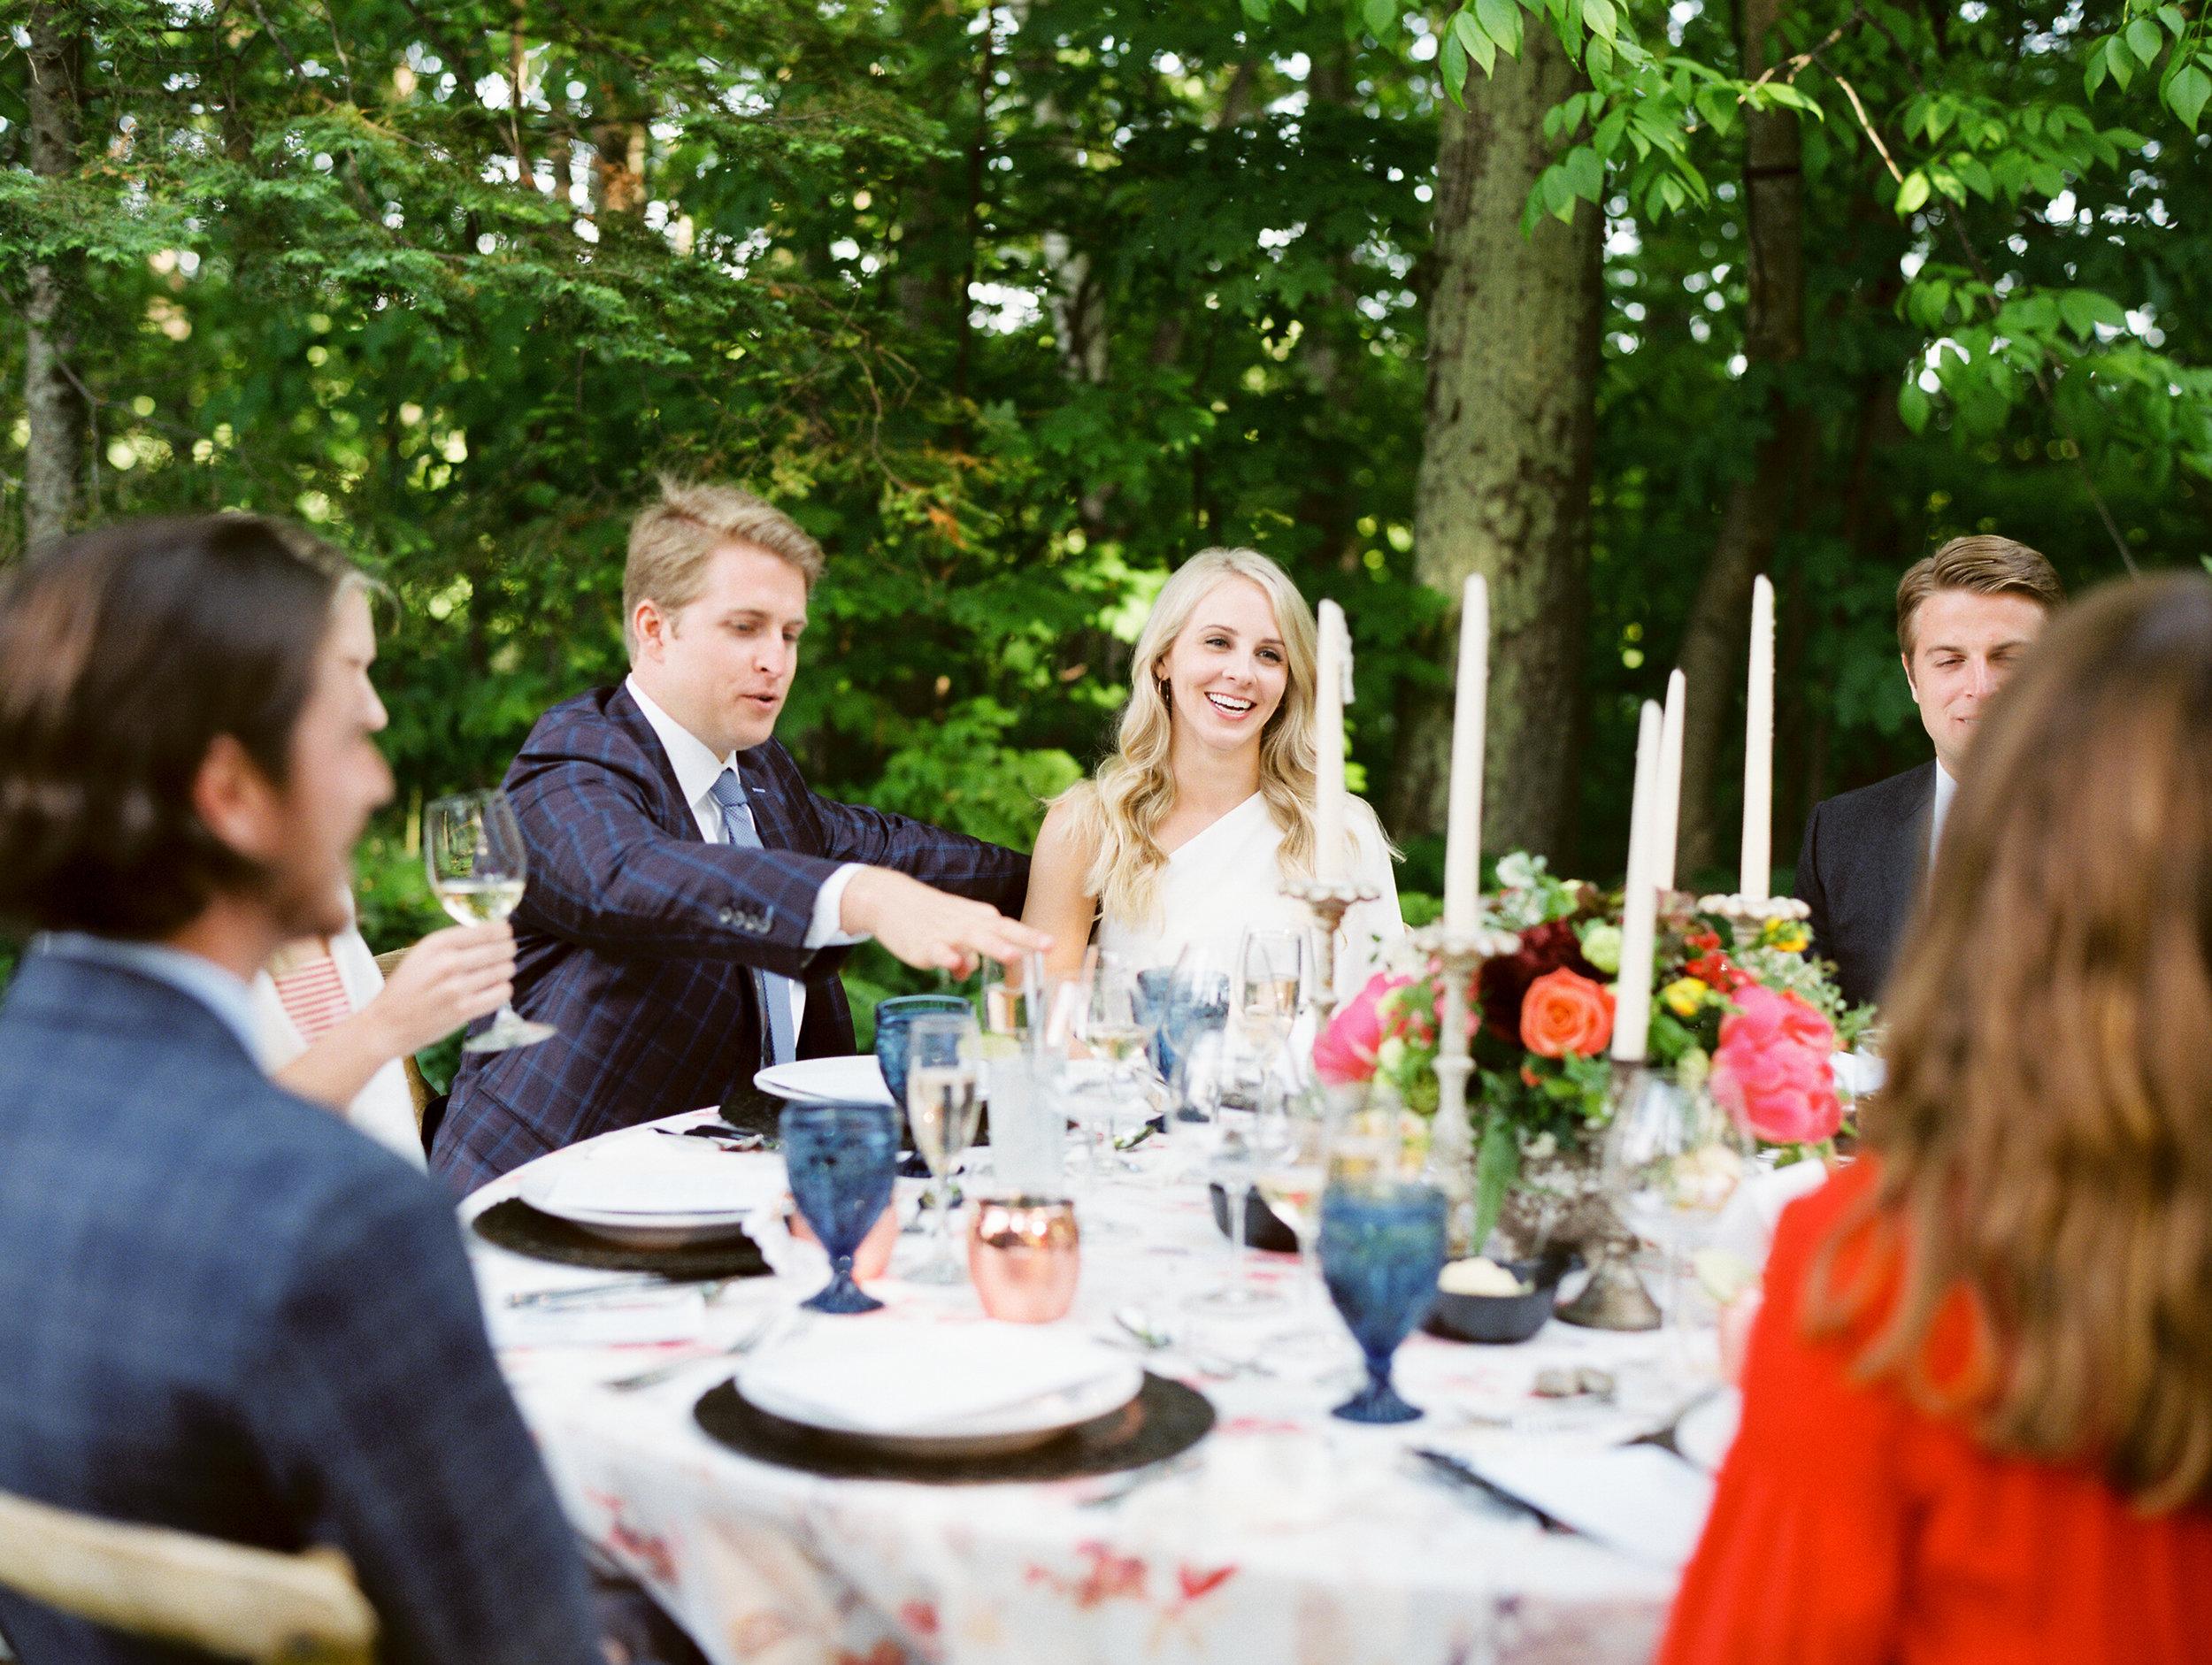 Coffman+Wedding+Rehearsal+Dinner-92.jpg